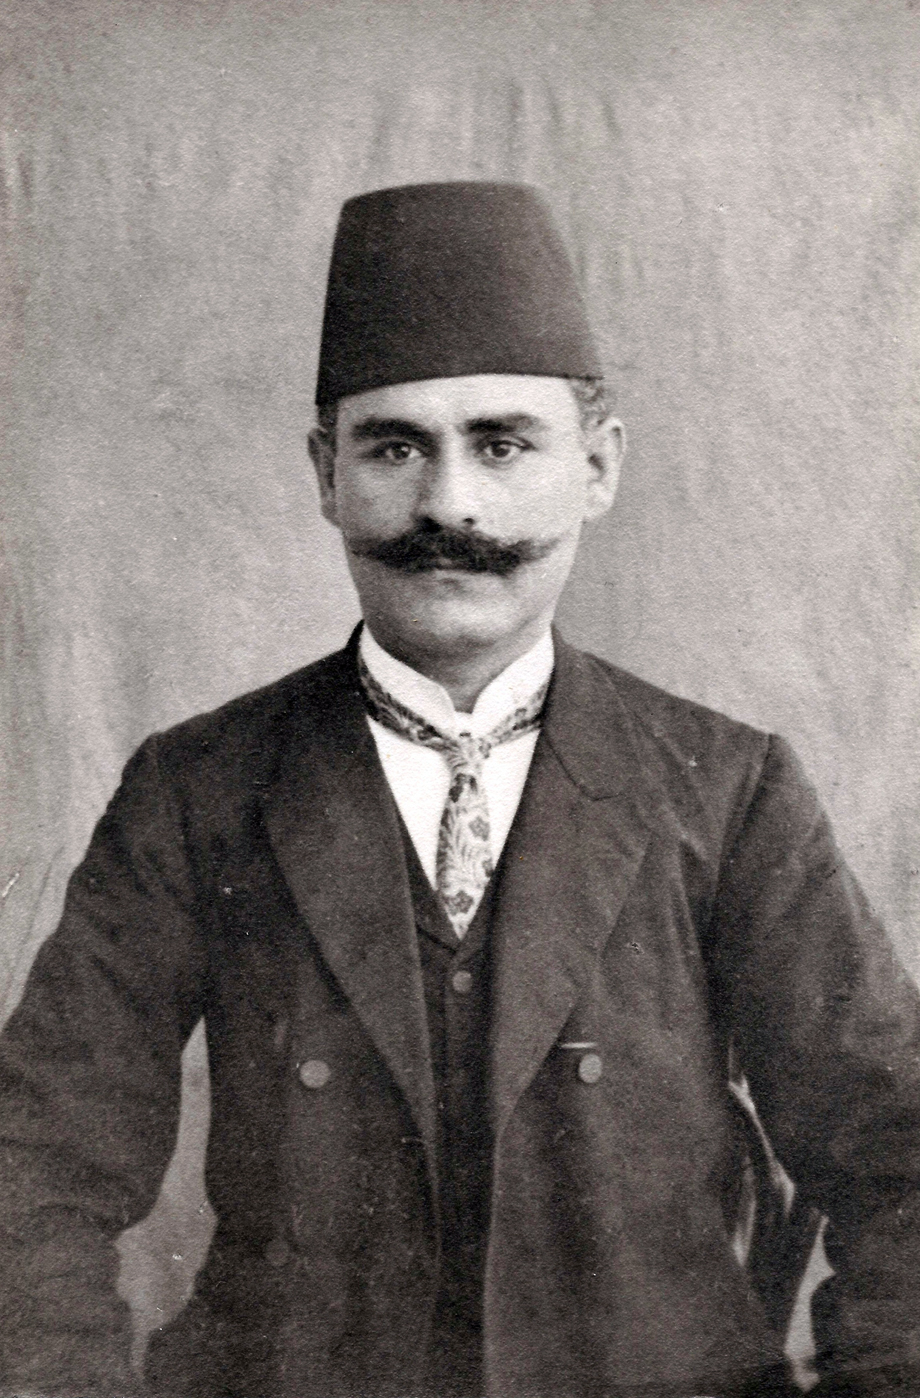 Dikran Kasardjian (1867-1929)